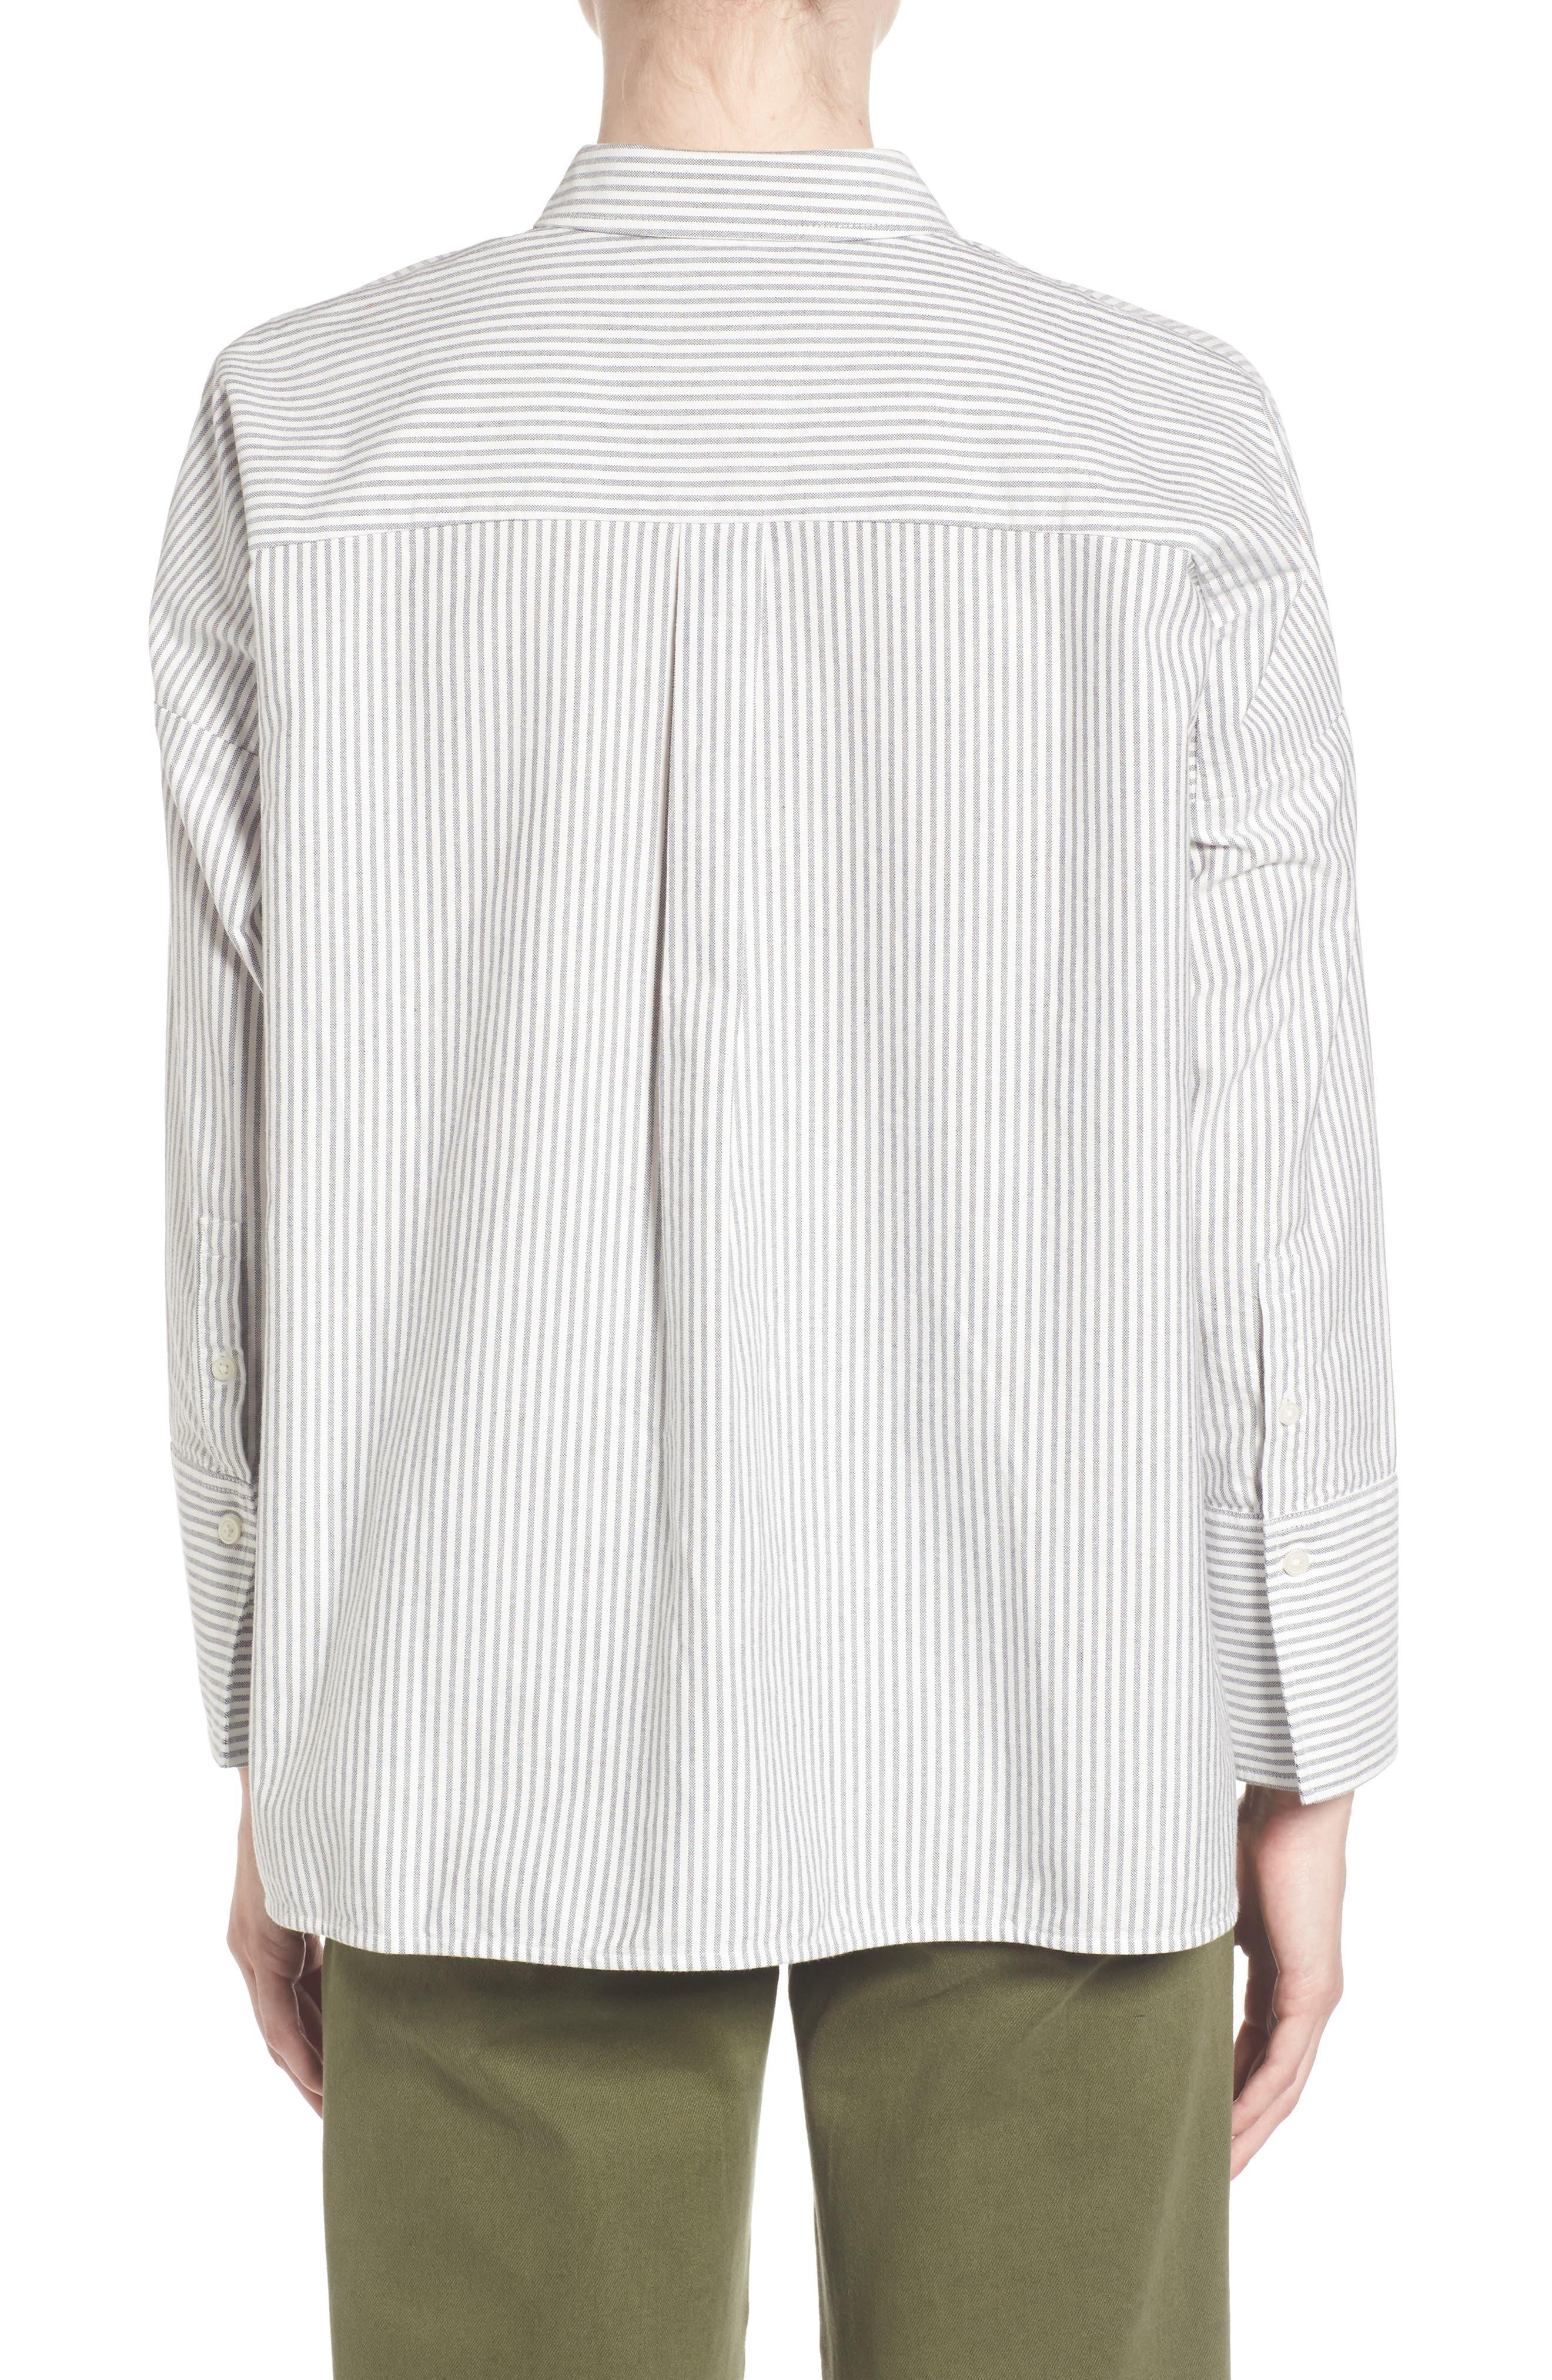 Alternate Image 2  - Everlane The Japanese Oxford Square Shirt